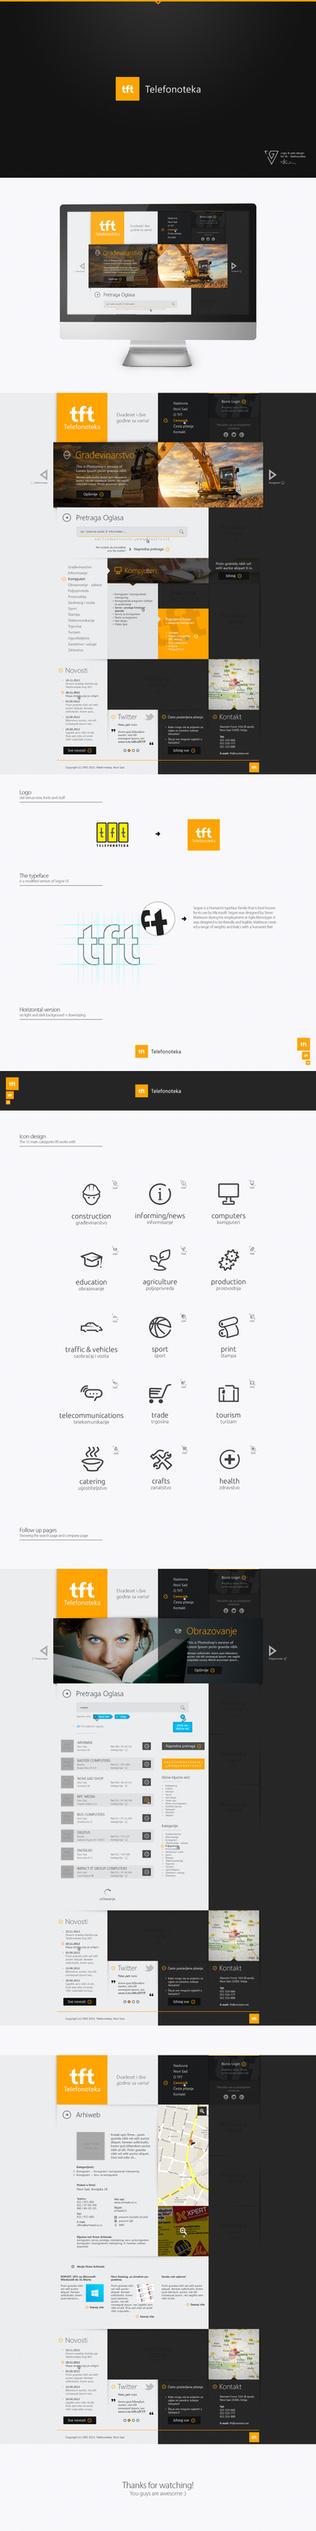 Logo and Web Design - TFT by Tngabor